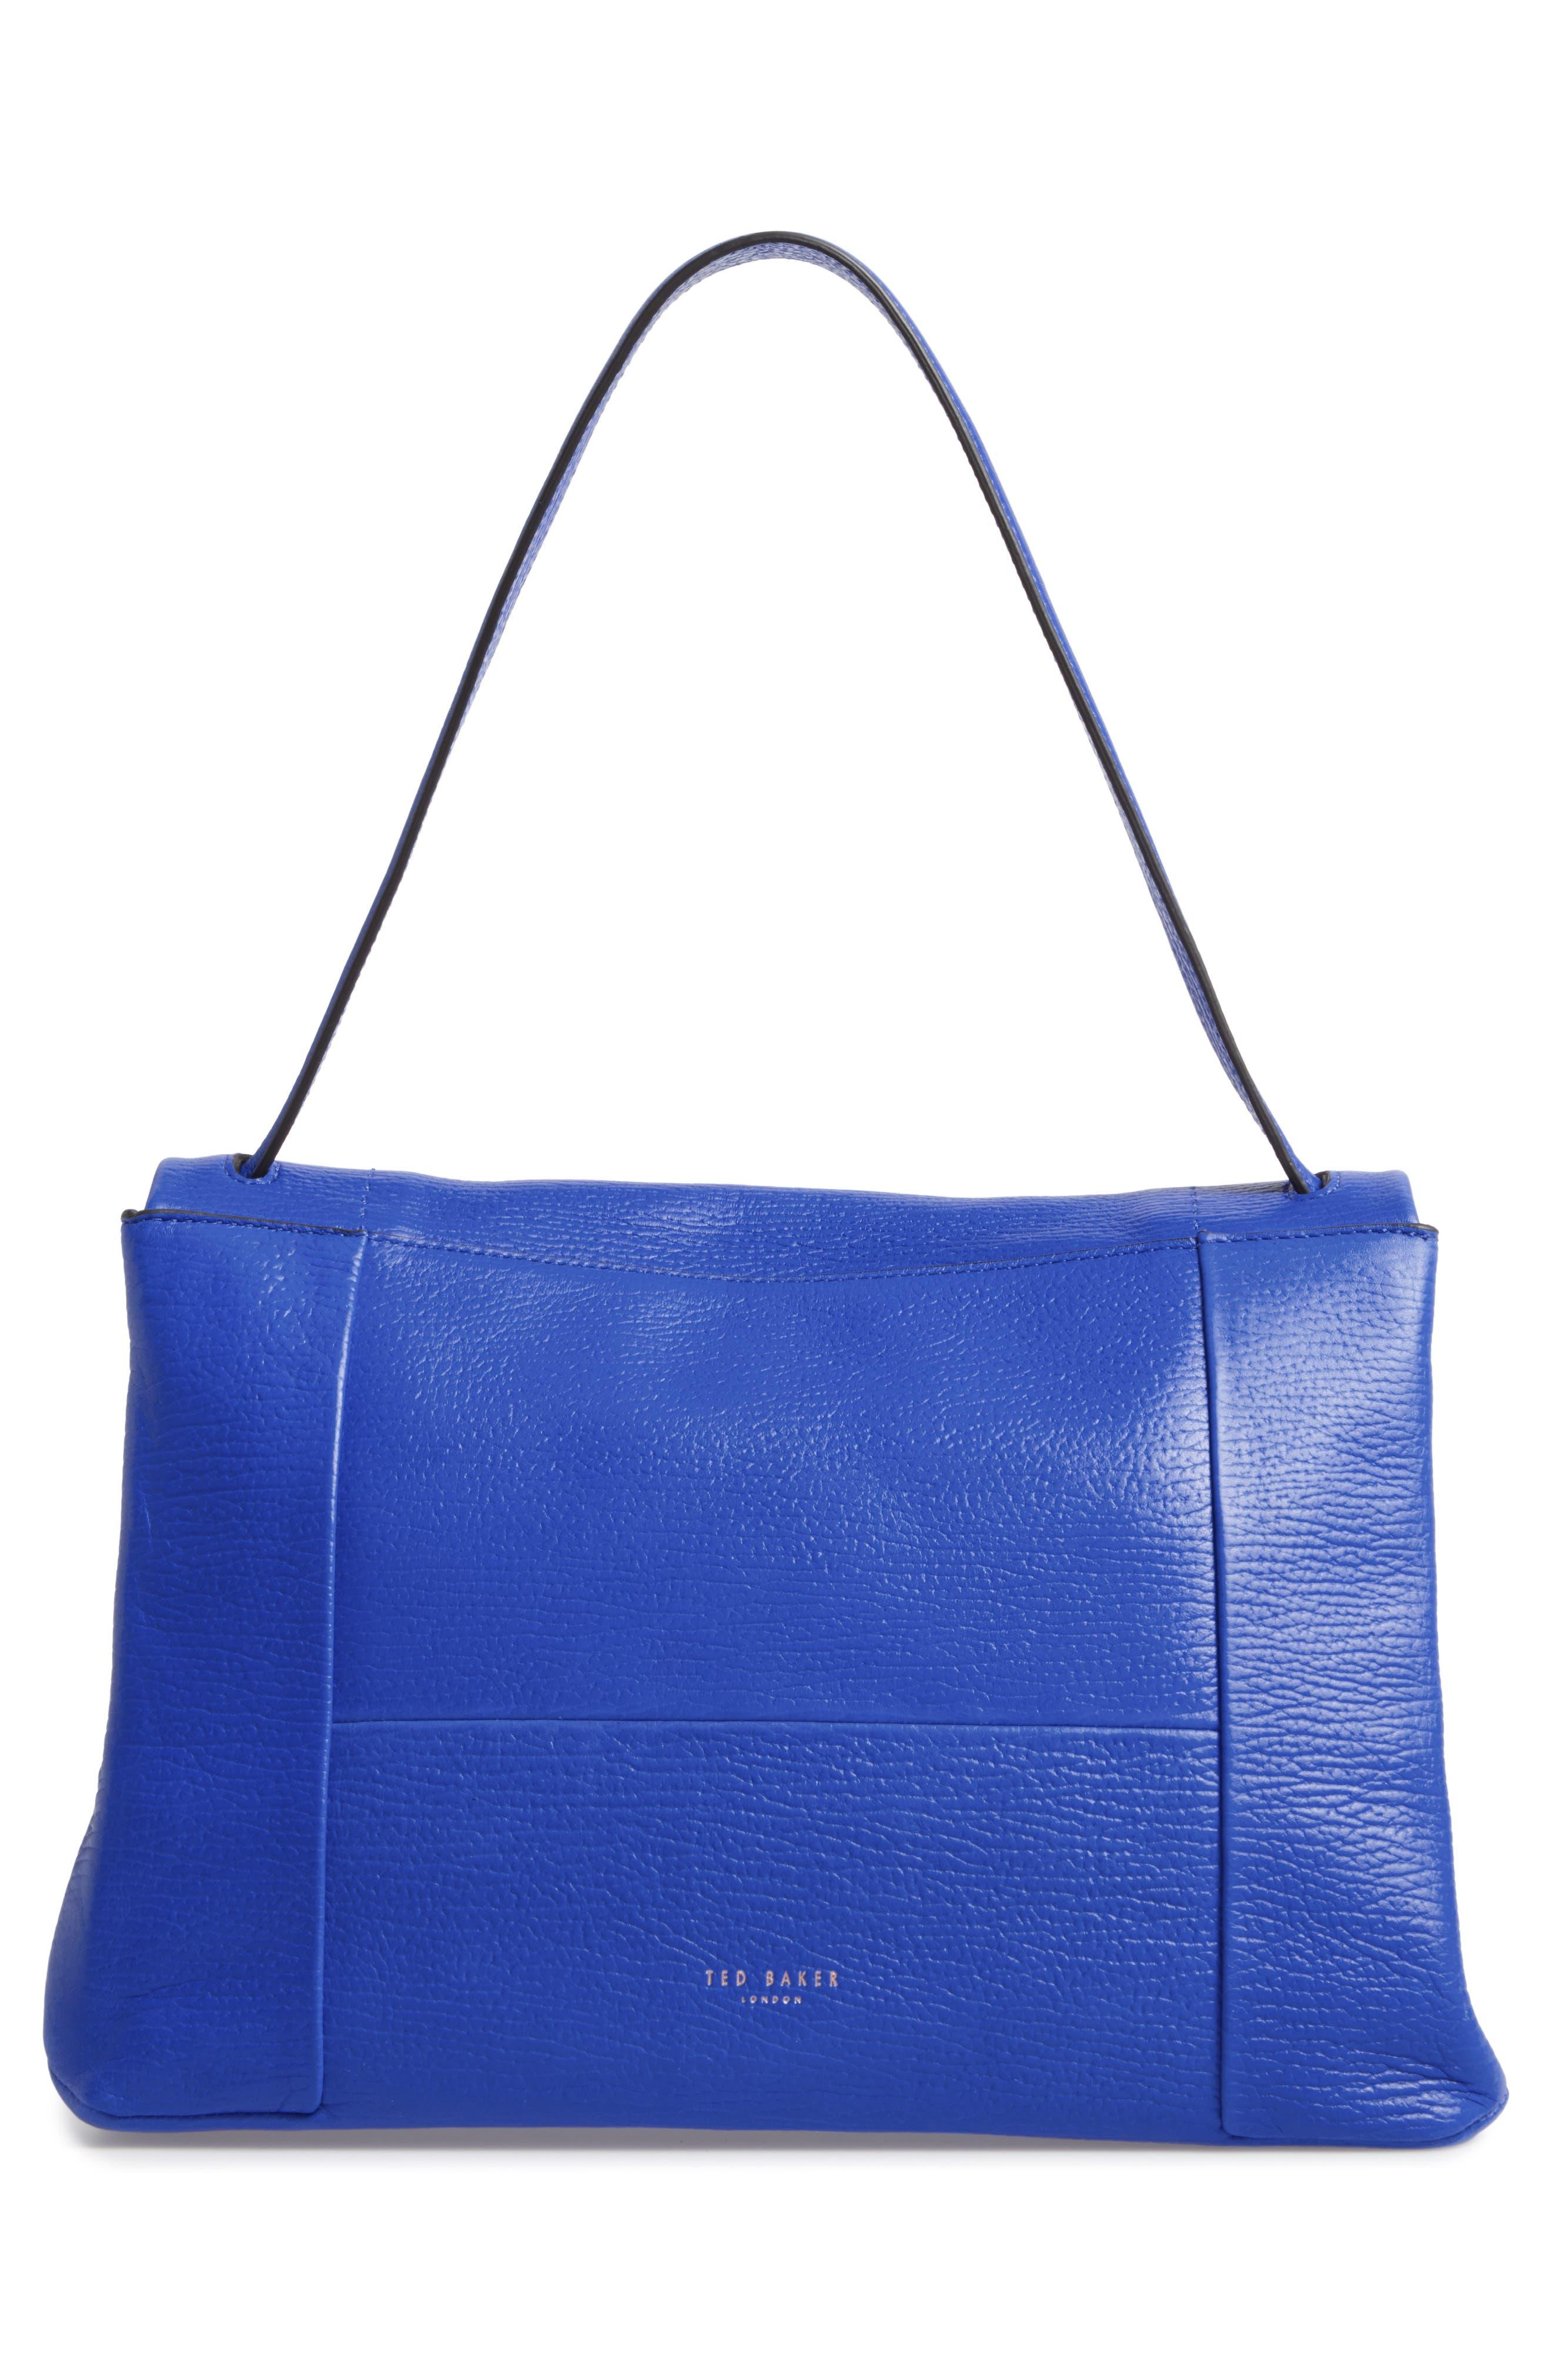 Proter Leather Shoulder Bag,                             Alternate thumbnail 2, color,                             Bright Blue